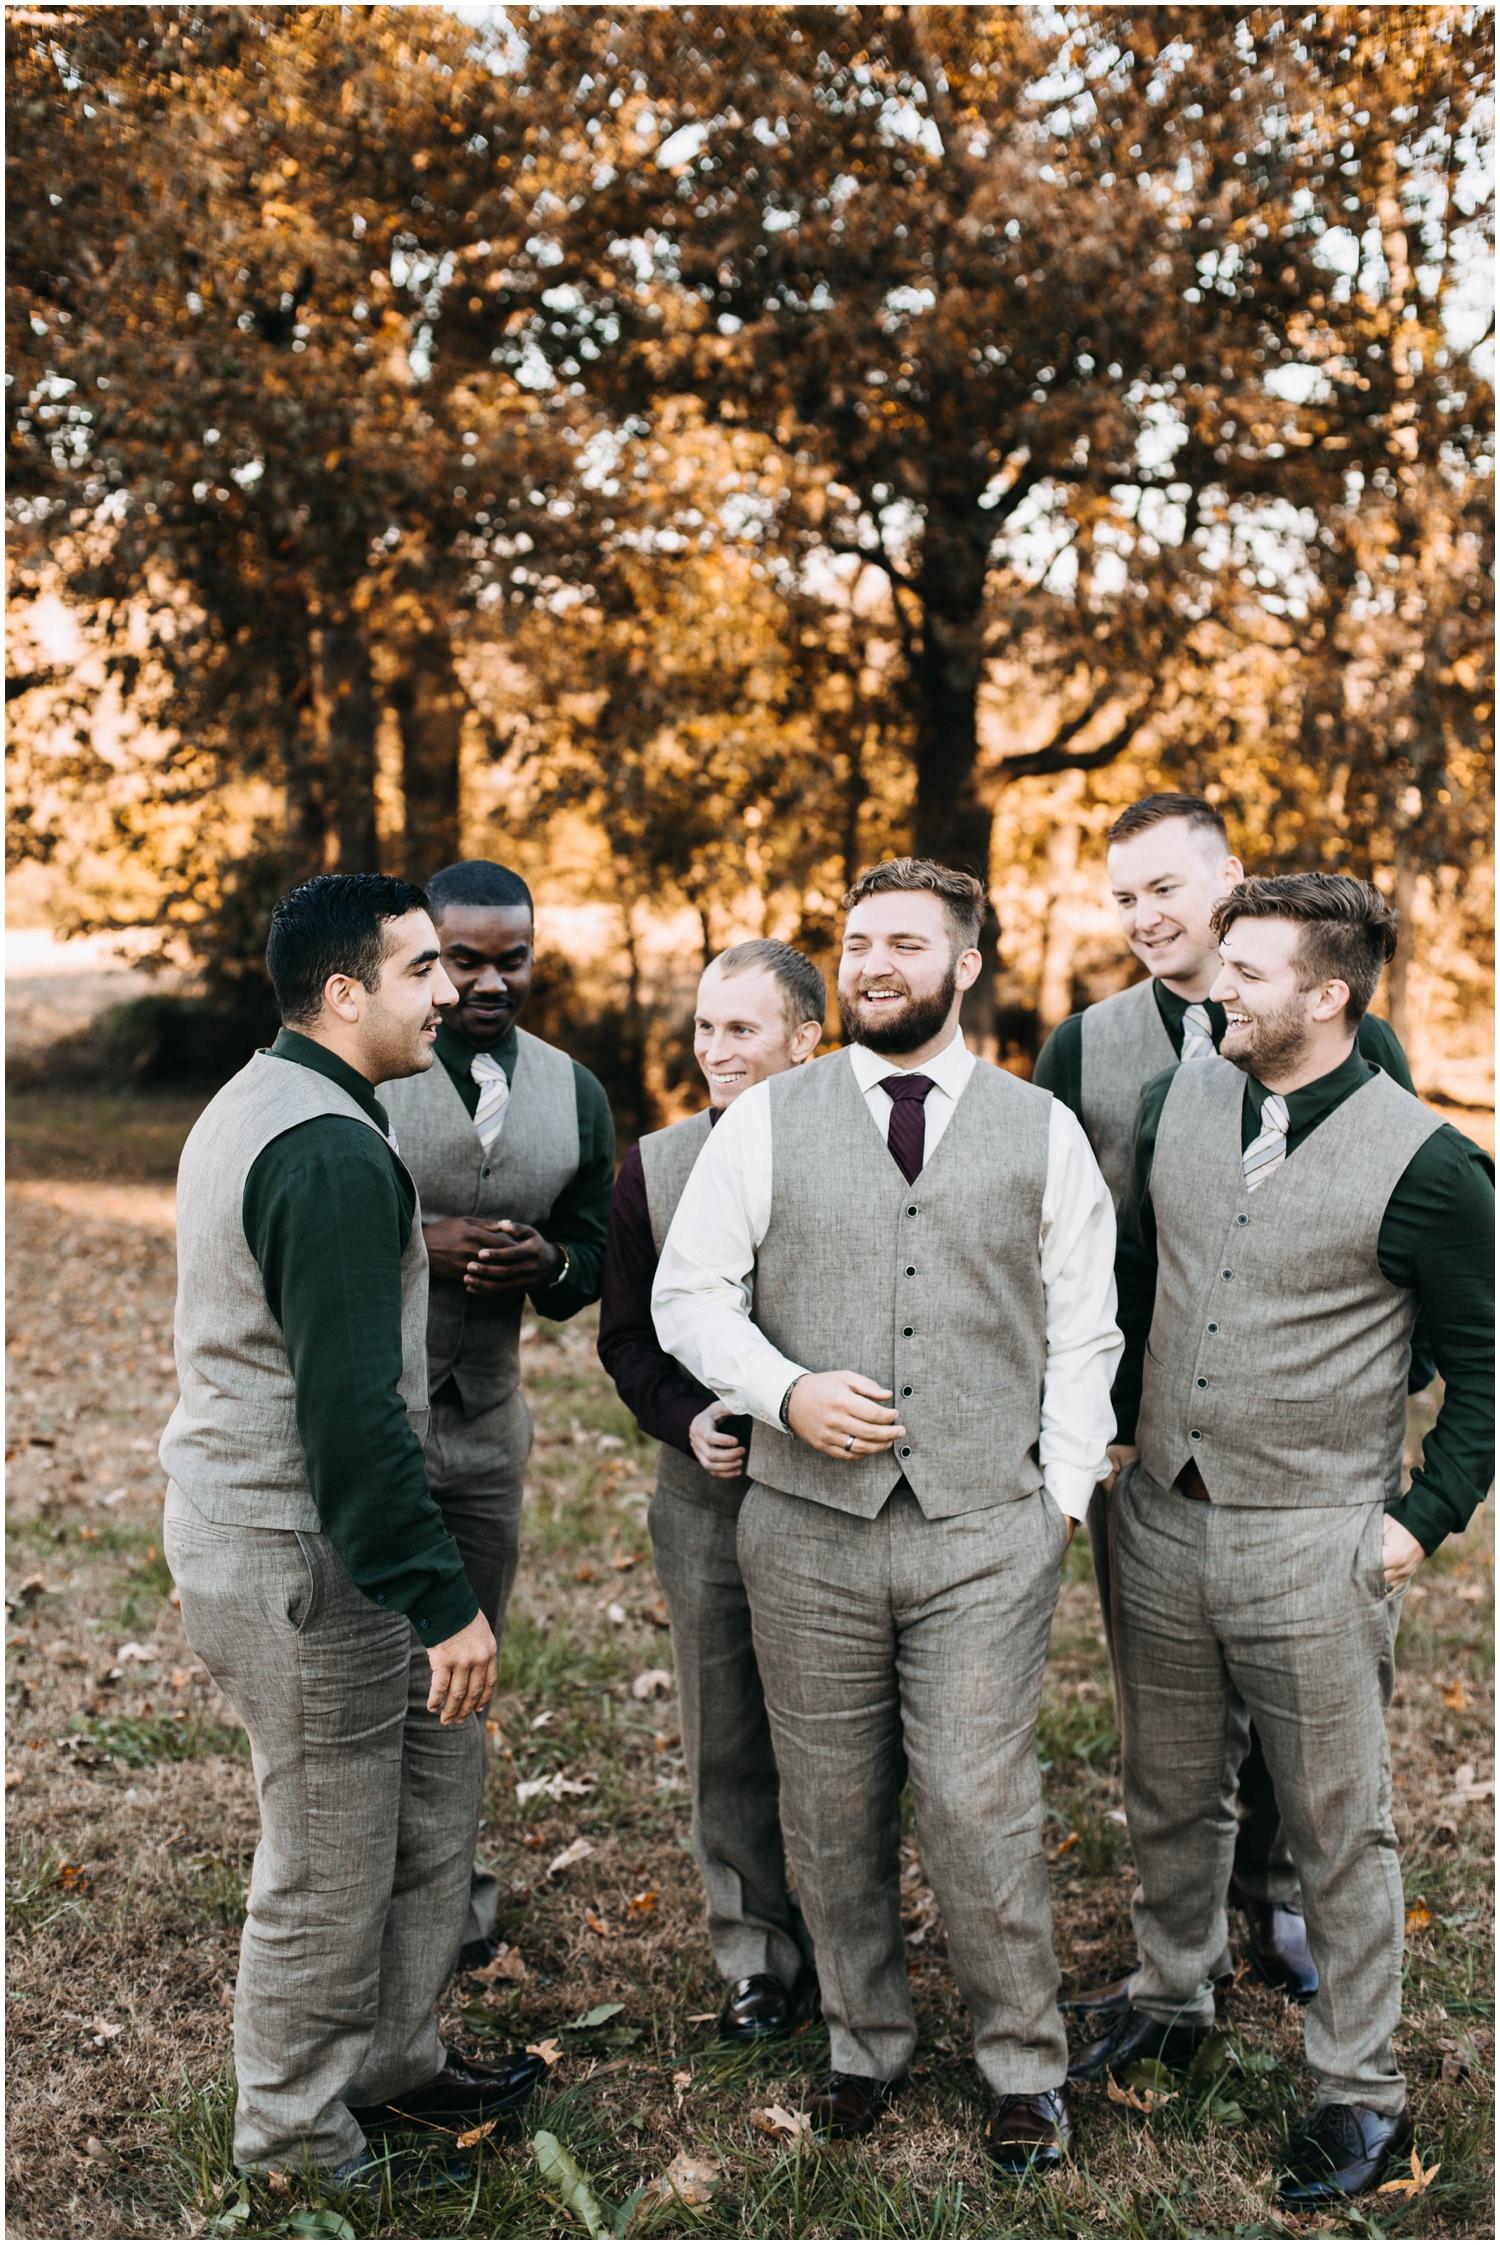 Jess+Dan_rustic_southern_farm_fall_wedding_charlotte_north carolina_taylor powers_0131.jpg